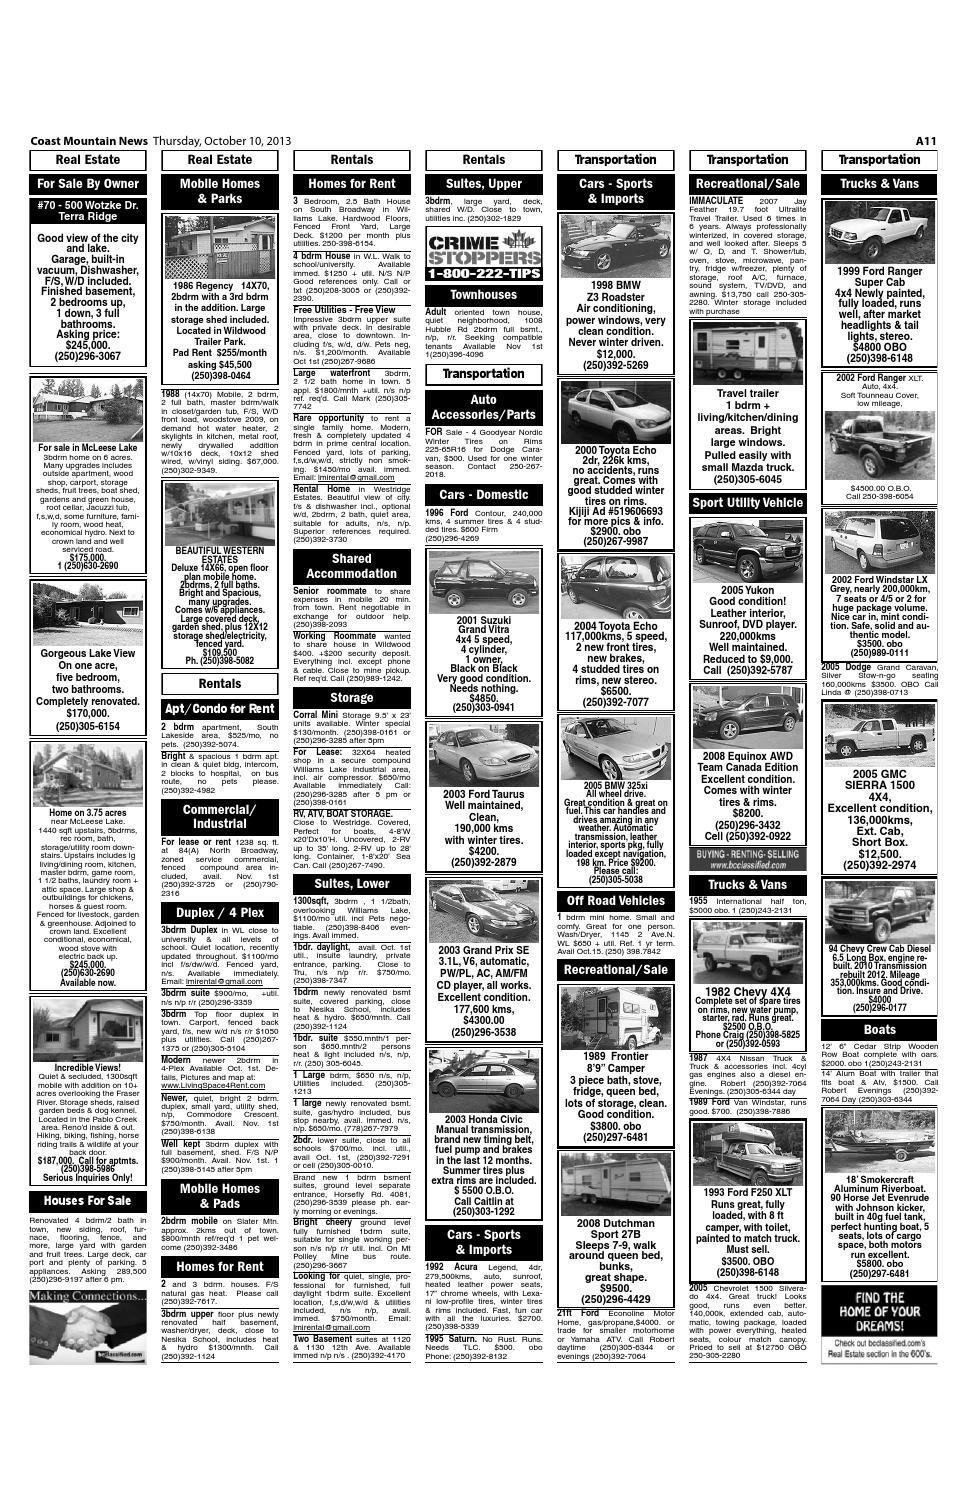 Coast Mountain News, October 10, 2013 by Black Press - issuu